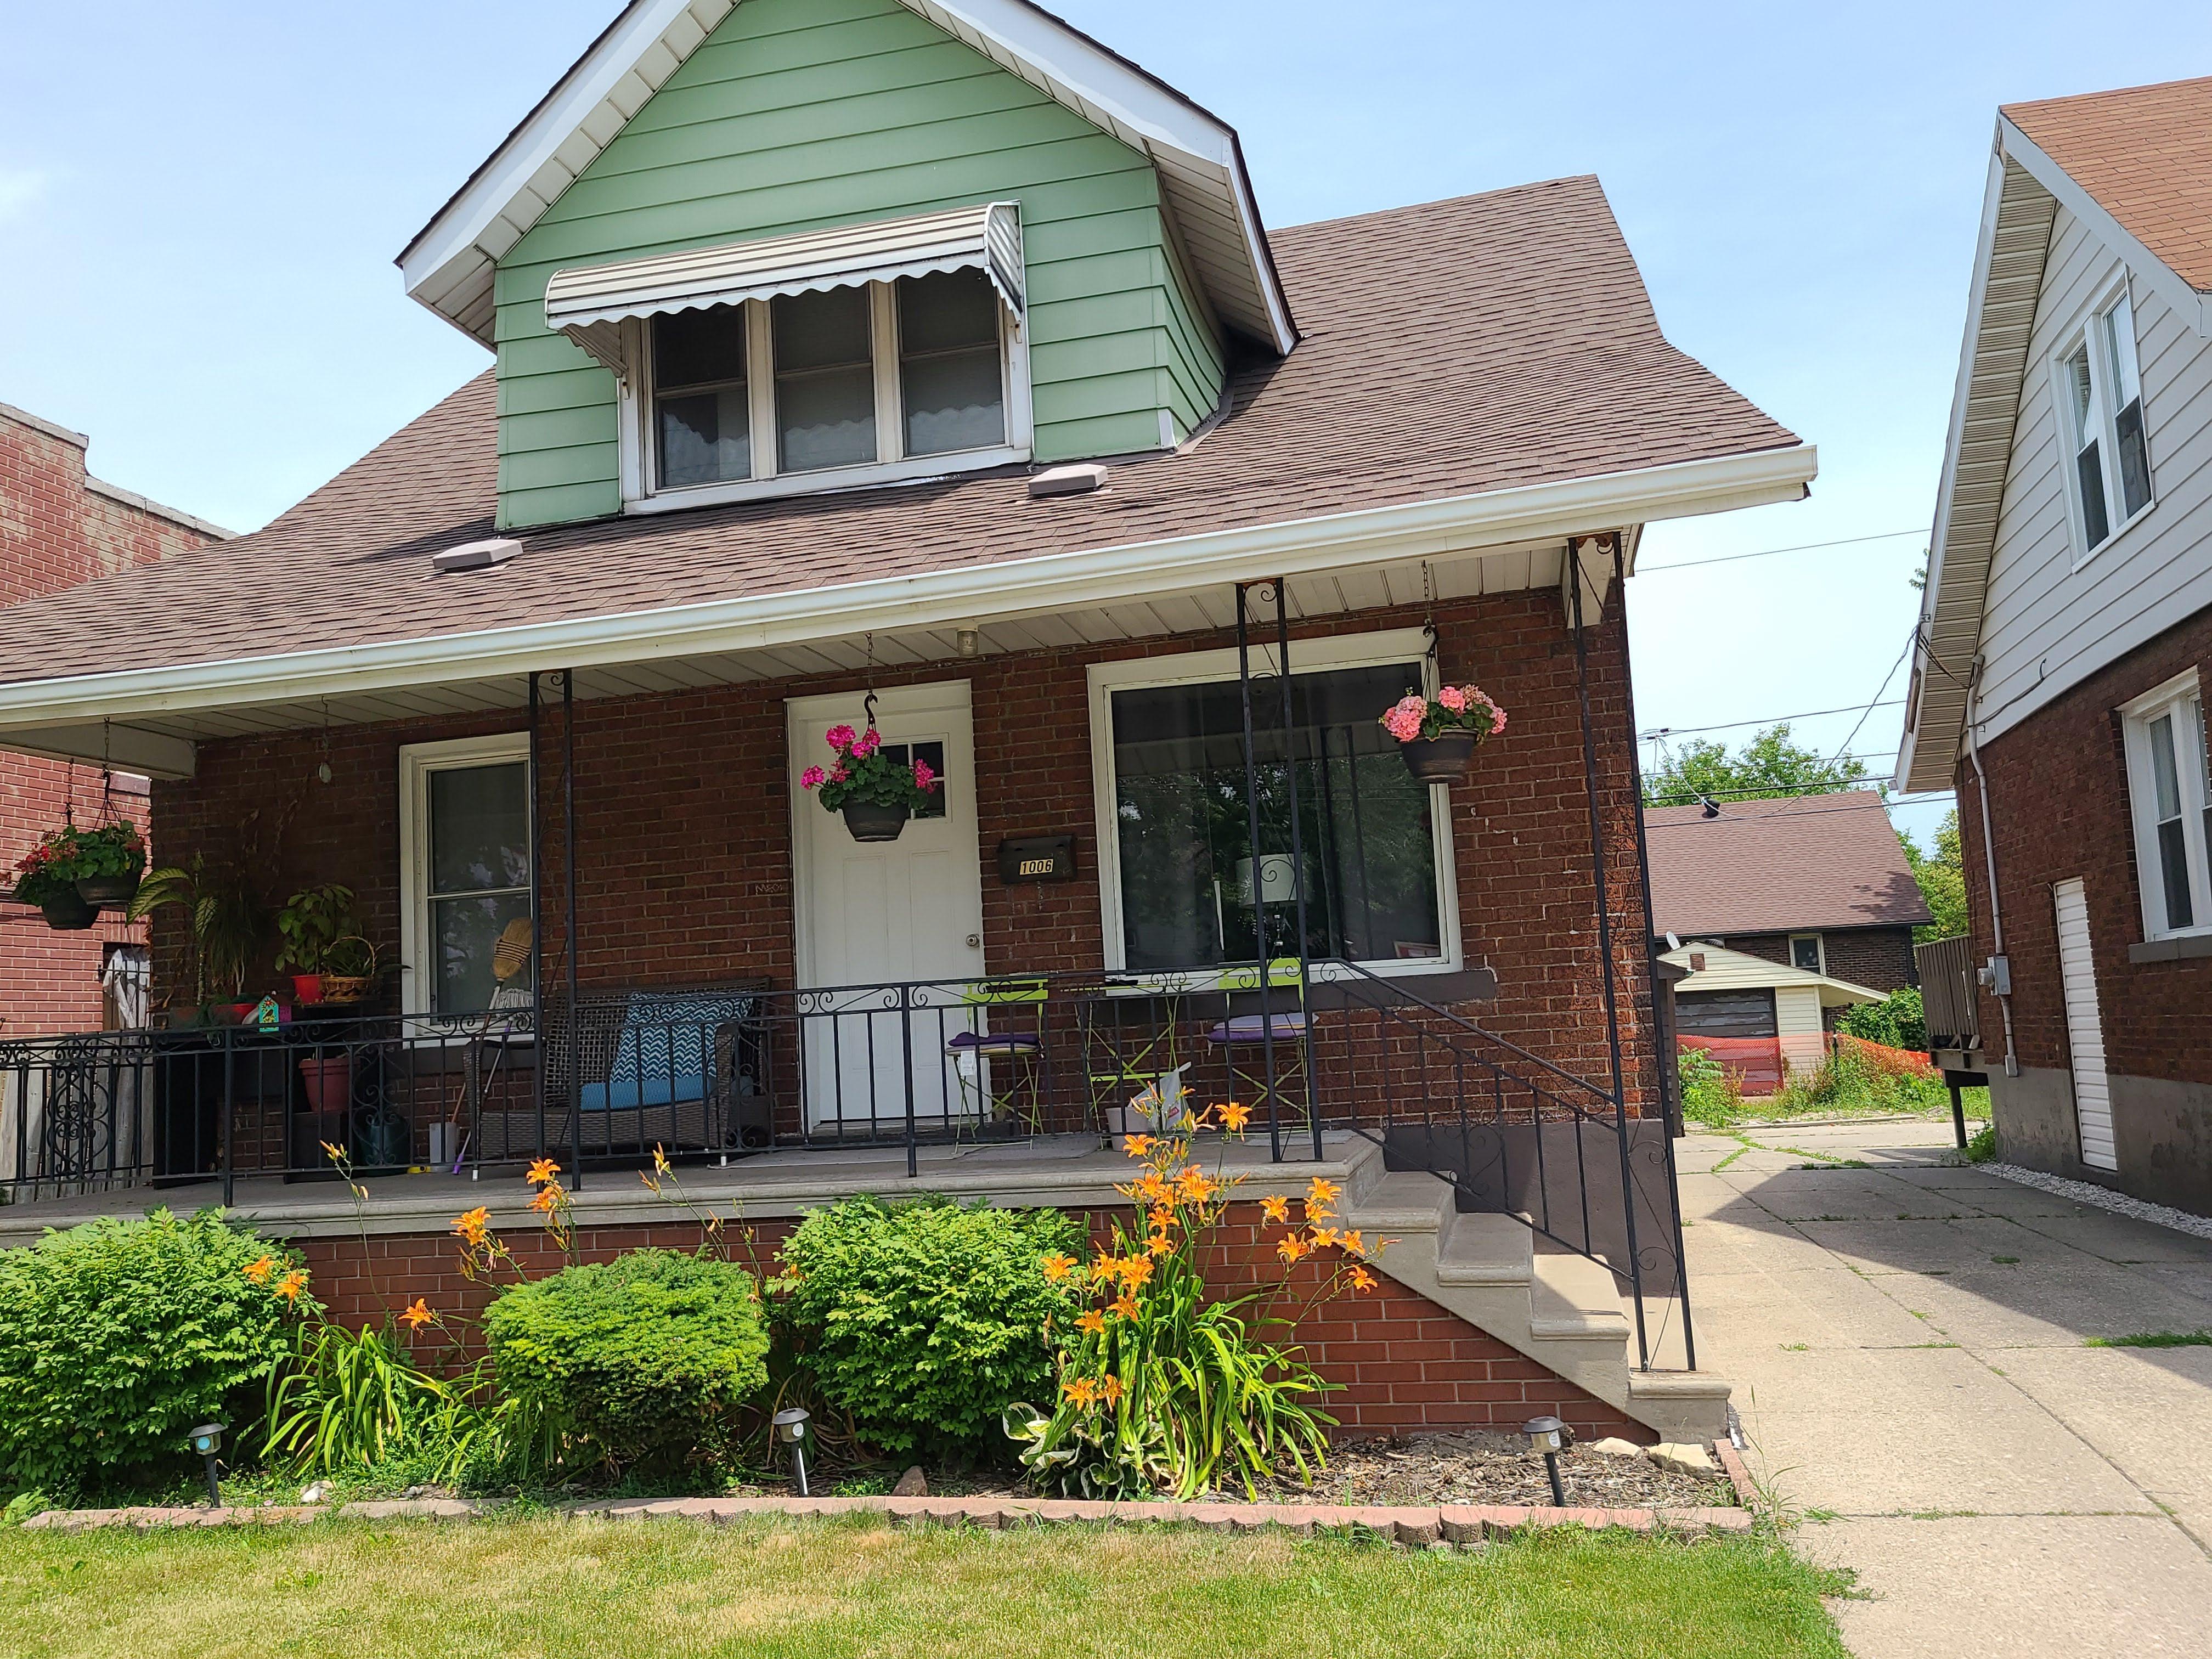 1006 Felix Ave, Windsor, Ontario  N9C 3L5 - Photo 2 - RP5413743784